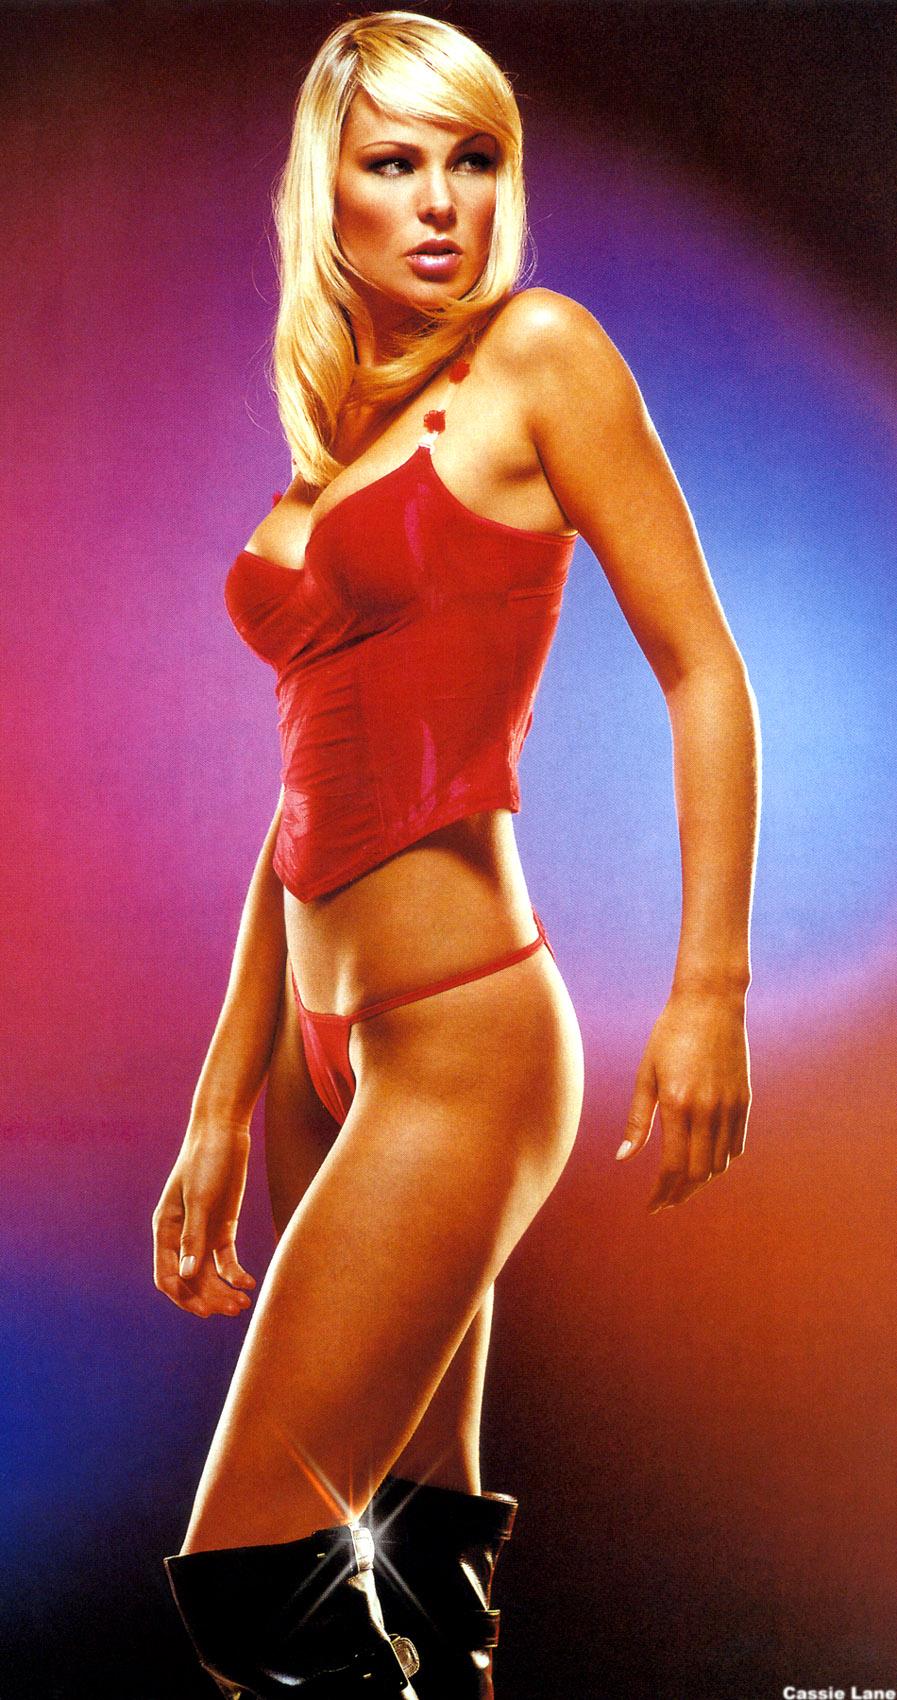 Cassie Lane - Photo Actress